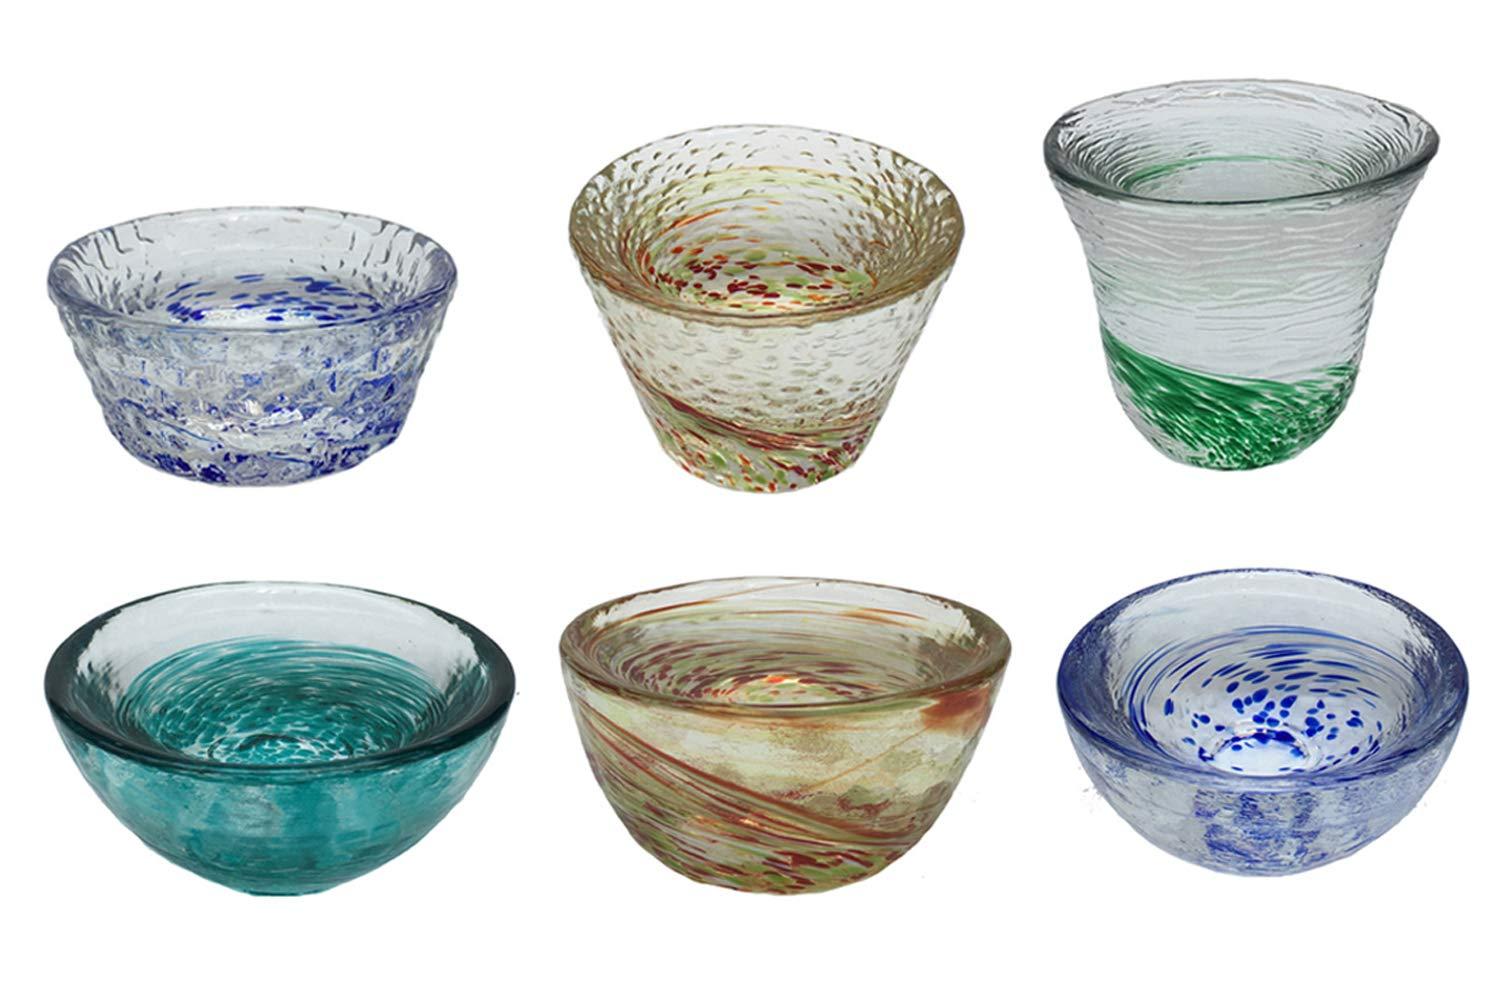 KCHAIN Pack of 6 Cold Sake Cups Set 2oz/60mL Drinkware Glasses Handcraft Rainbow Color Decor Thick Glass Teacups Perfect for Sake Wine Liquor Tea